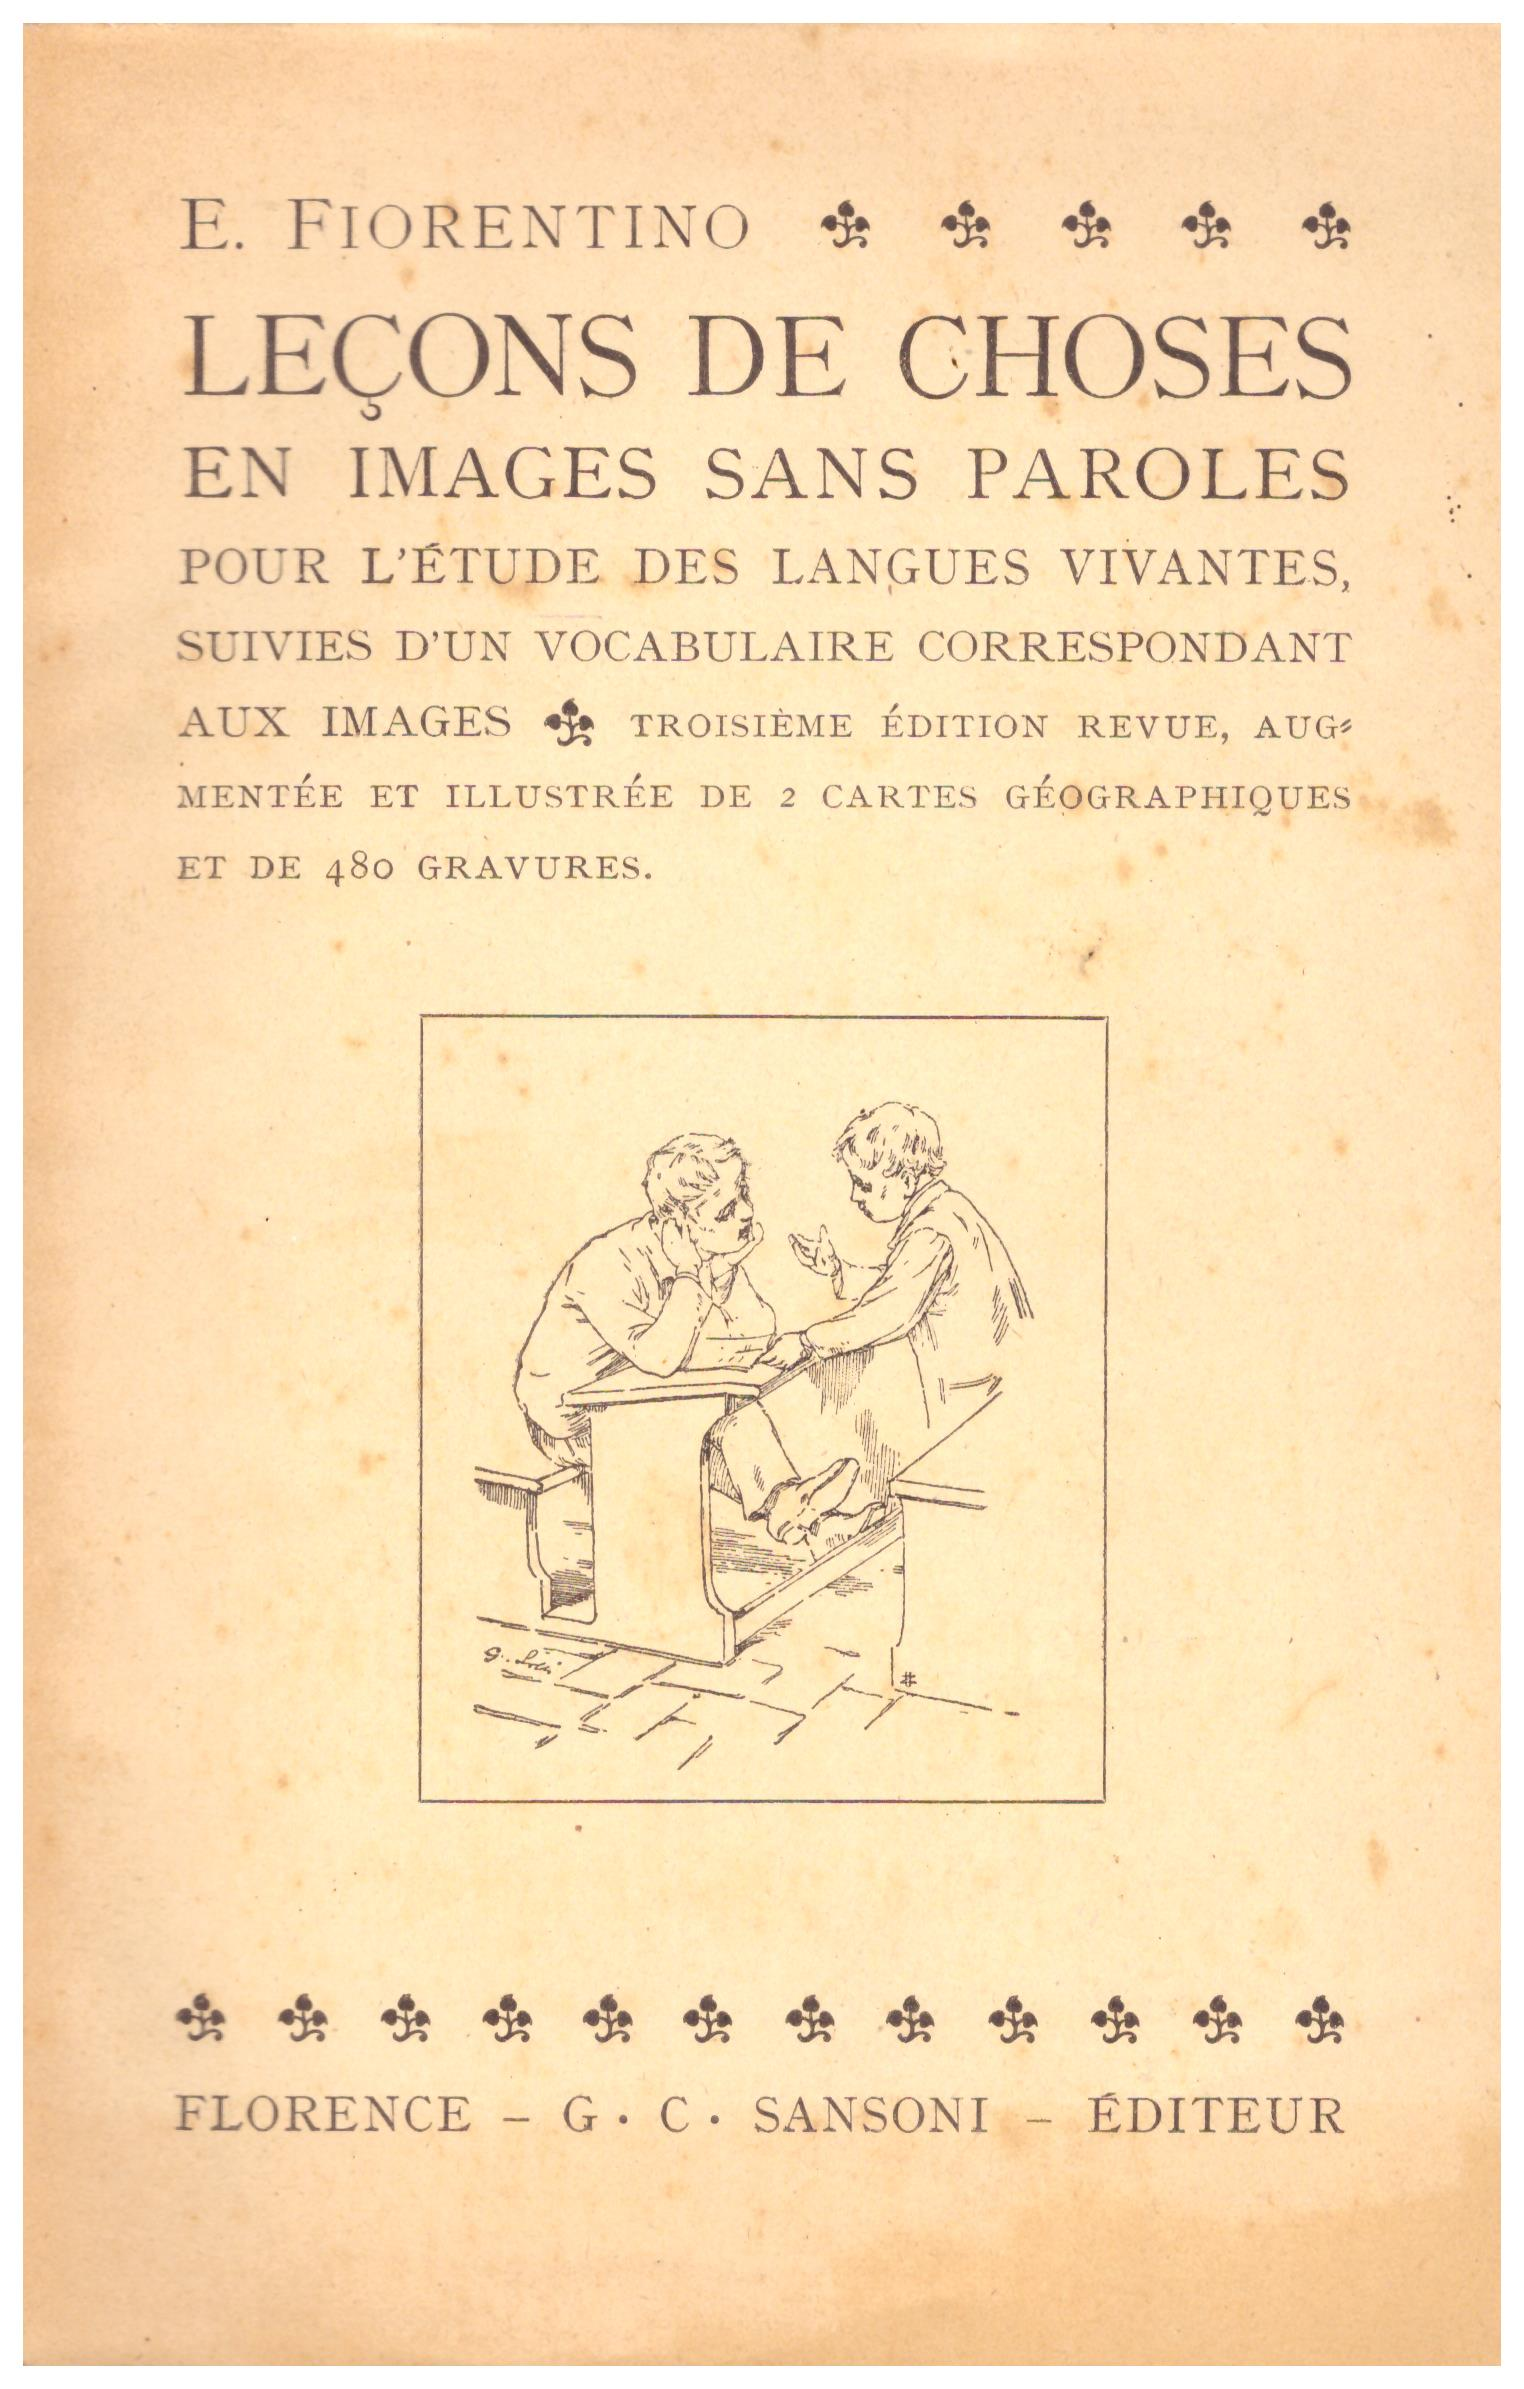 Titolo: Lecons de choses en images sans paroles    Autore: E. Fiorentino    Editore: Sansoni, Firenze 1931